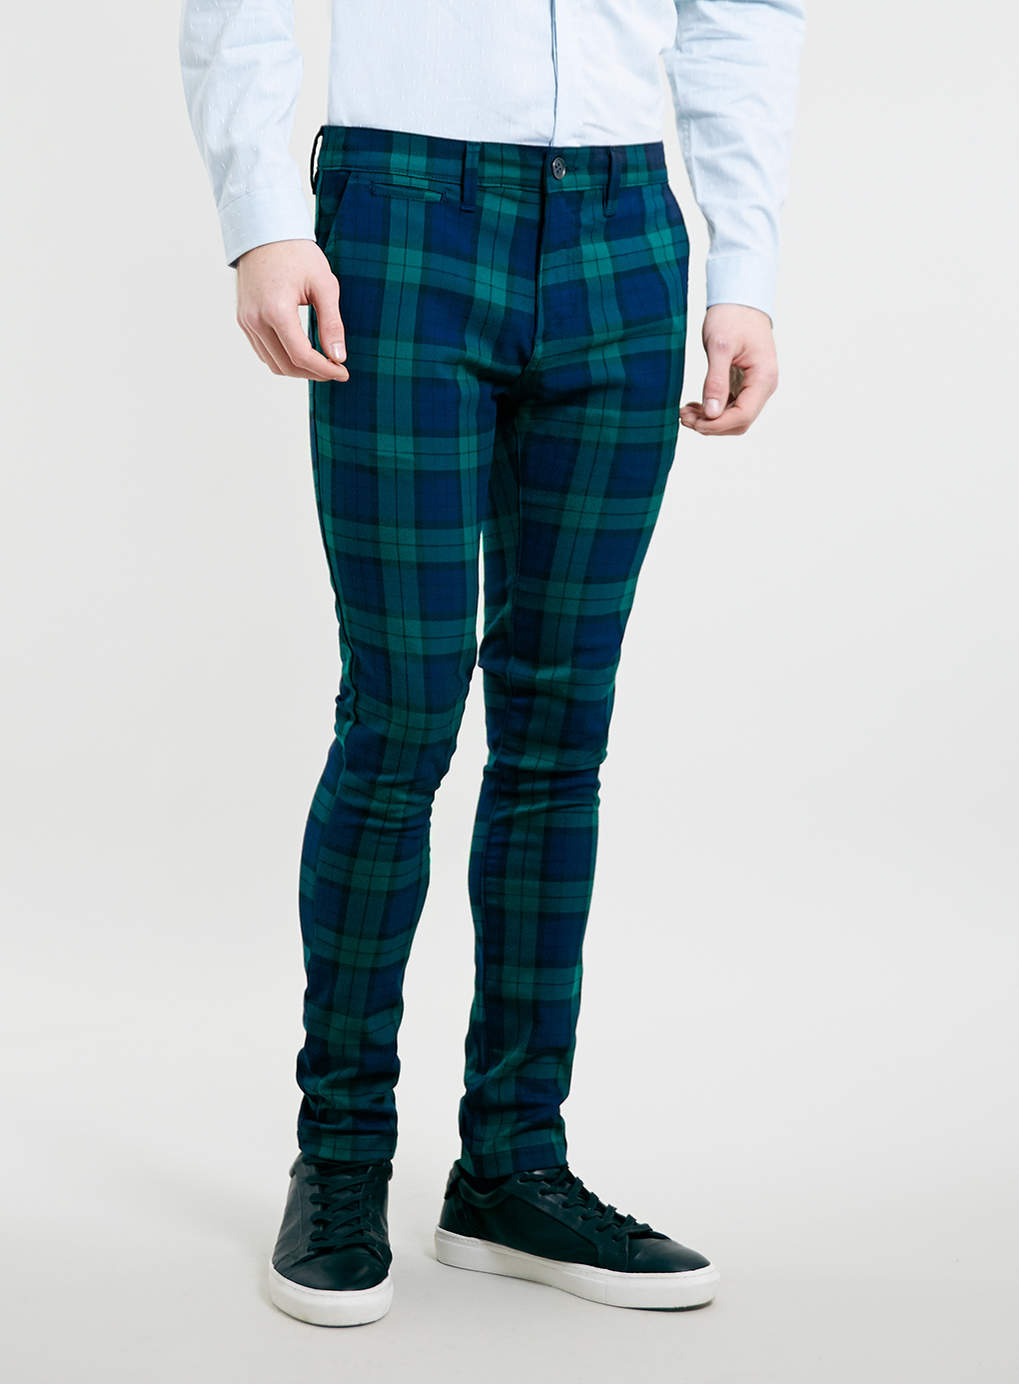 Topman Green Tartan Skinny Chino Pants In Green For Men Lyst